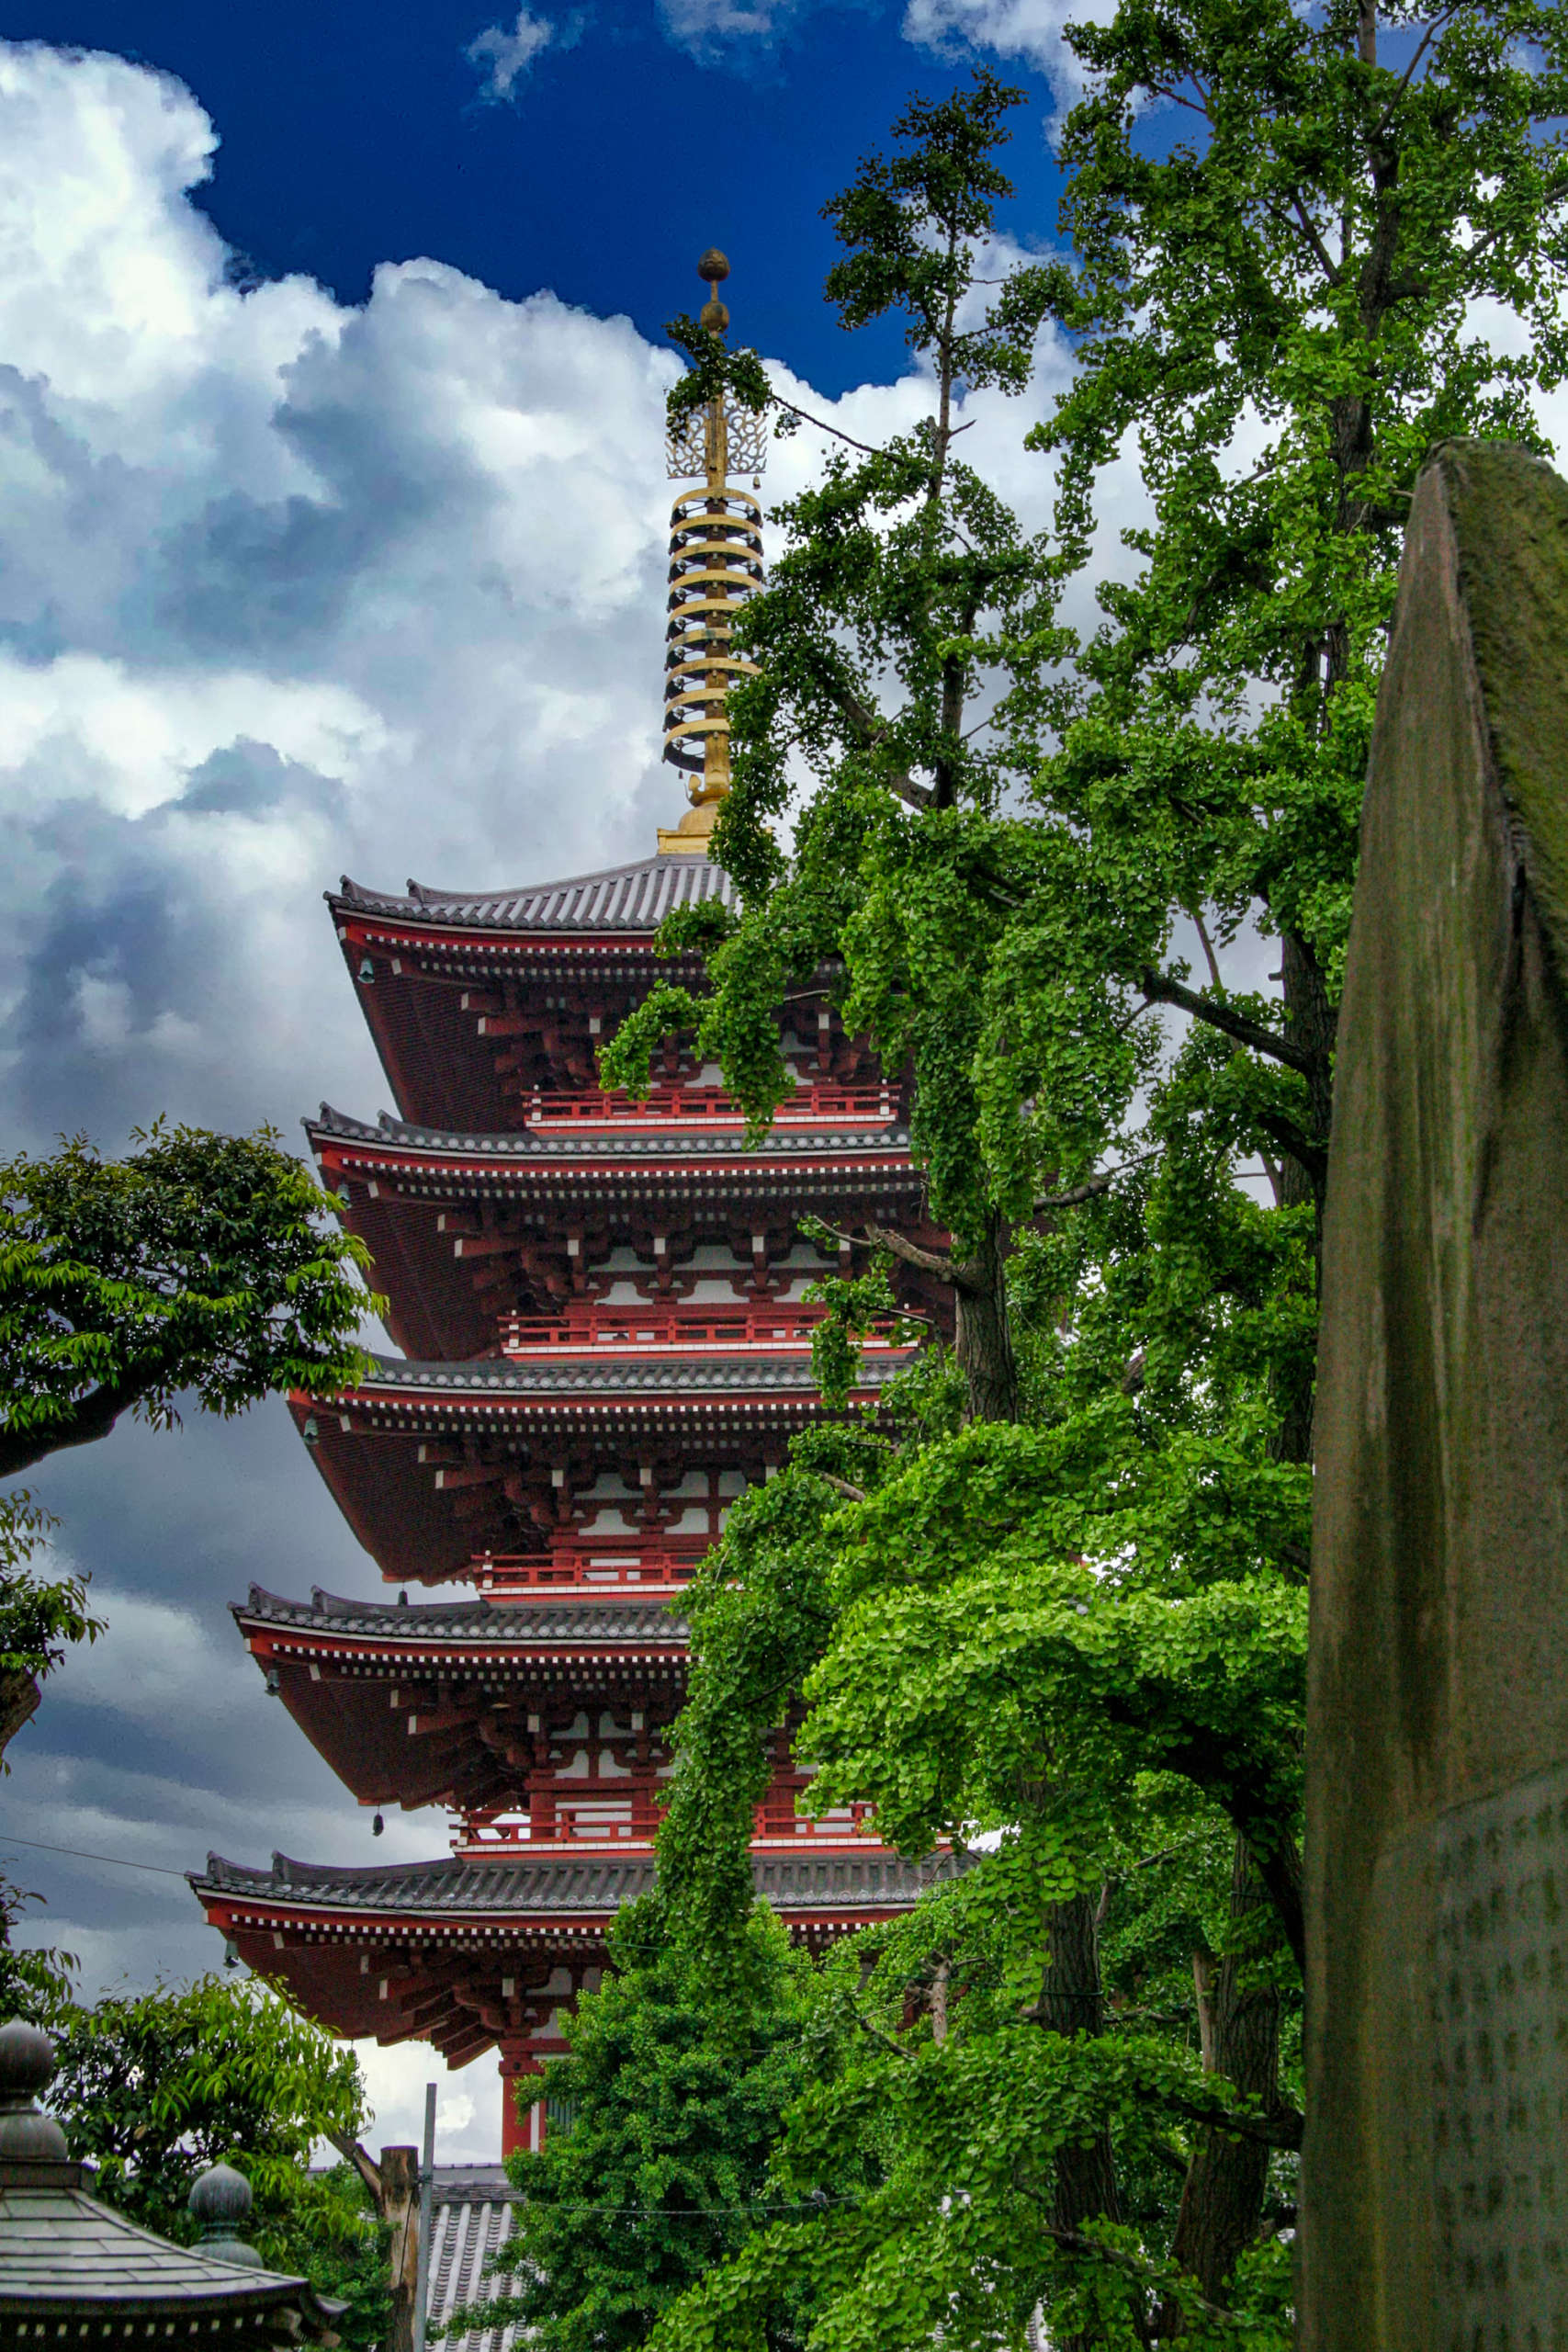 SEL_instagram_bds_06052020__japaninamug__pagode_sensoji__tokyo_Tokyo_temple_asakusa_pagode-Modifier